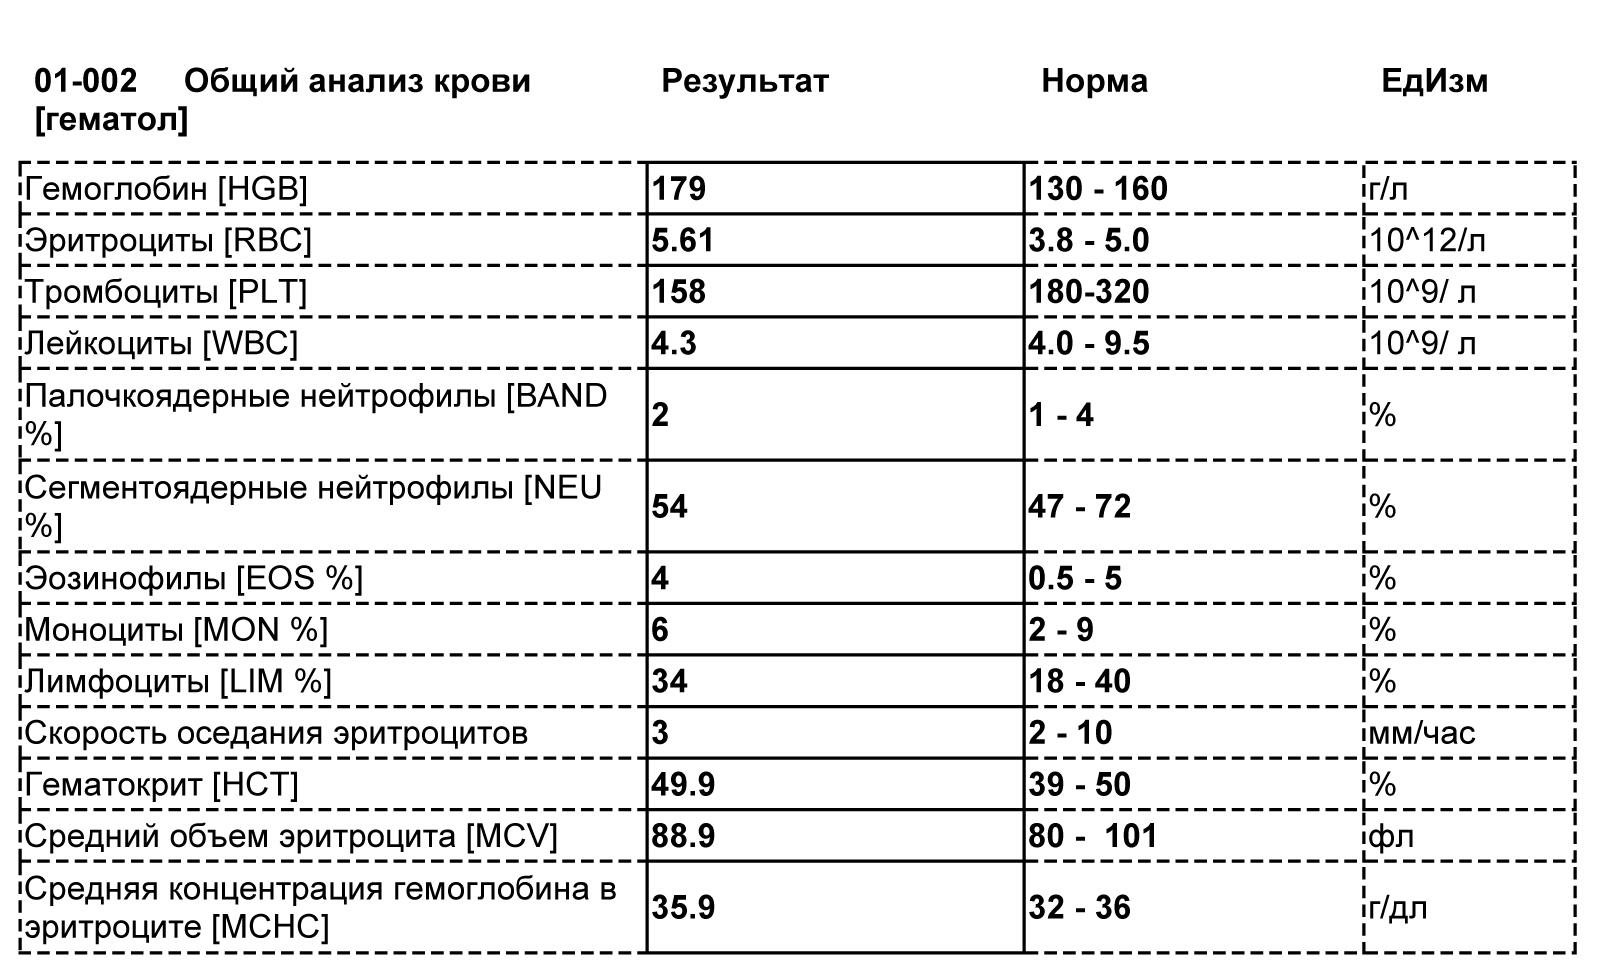 Cpk анализ крови инвитро экспресс в анализы крови